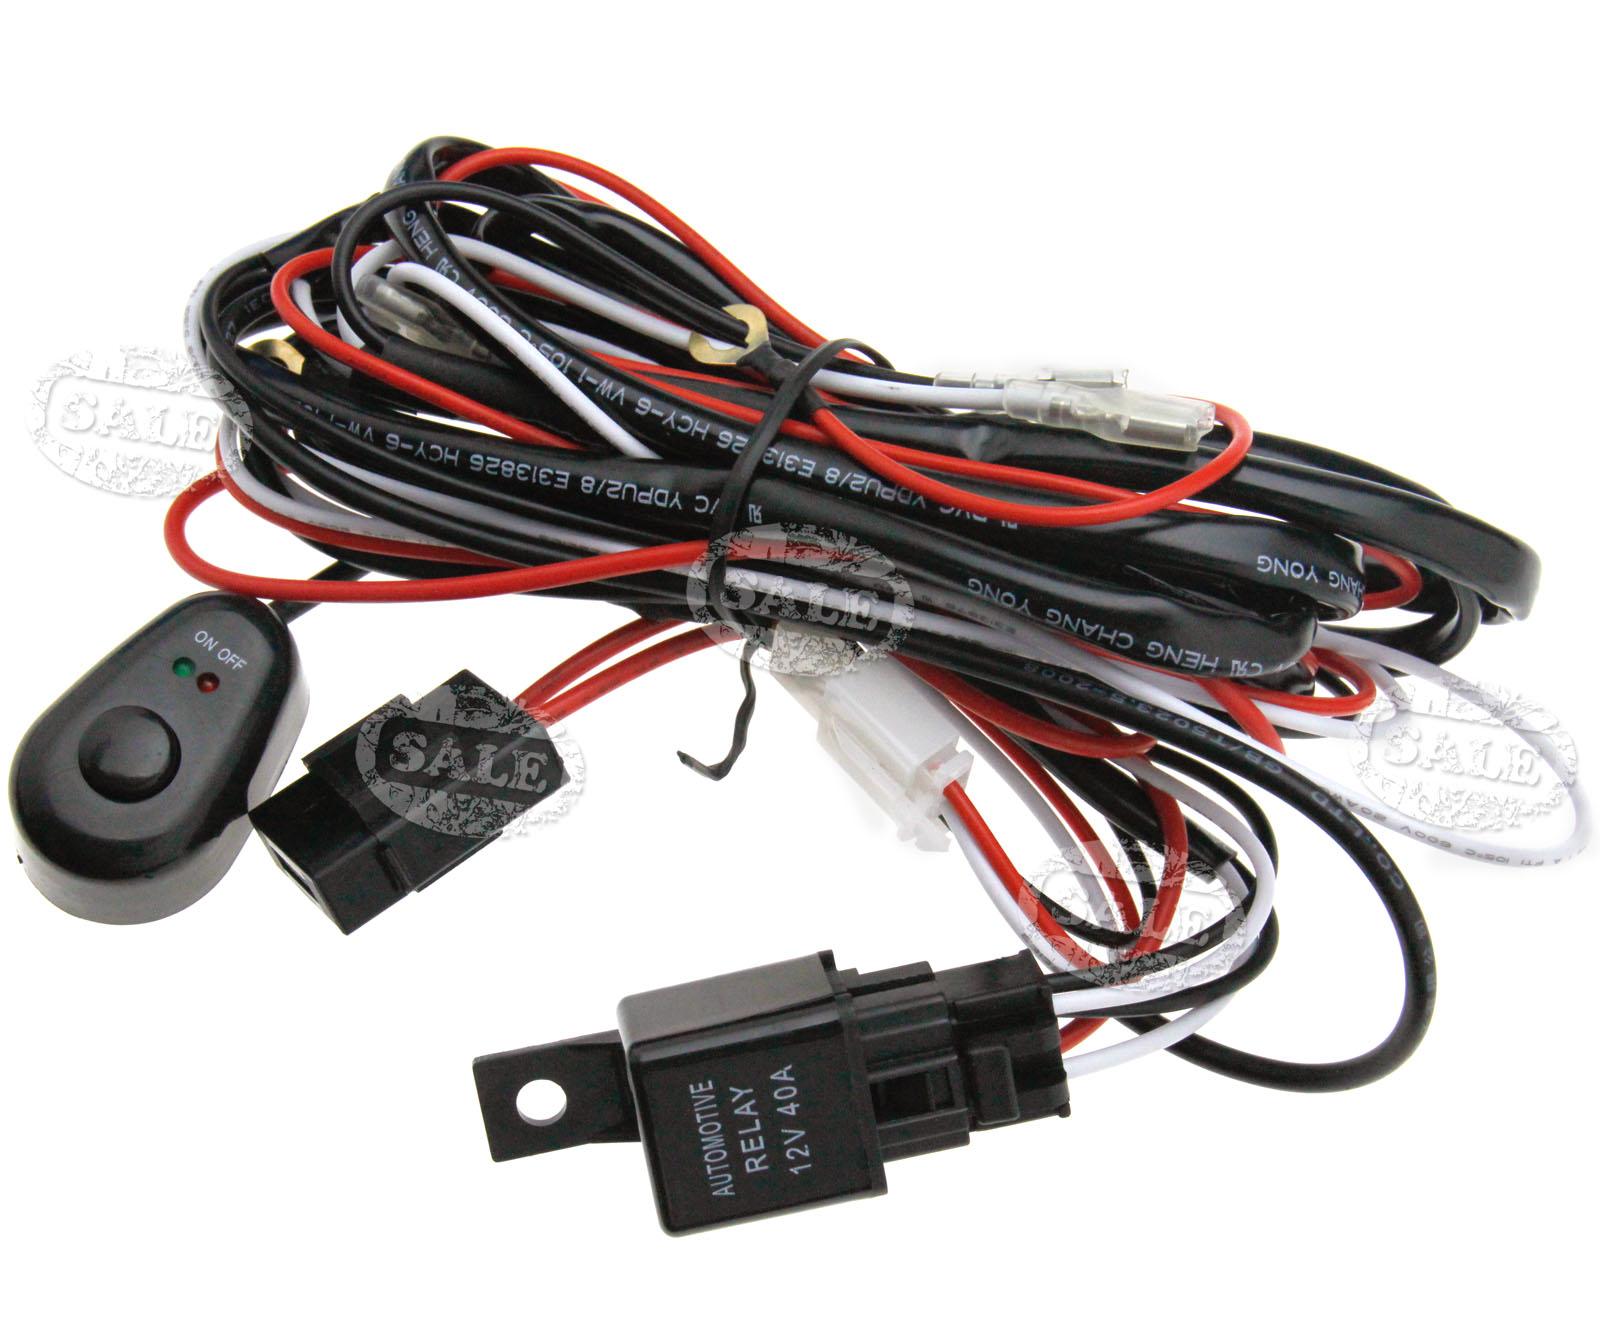 12V Universal HID Driving Spot Light Wiring Harness Kit